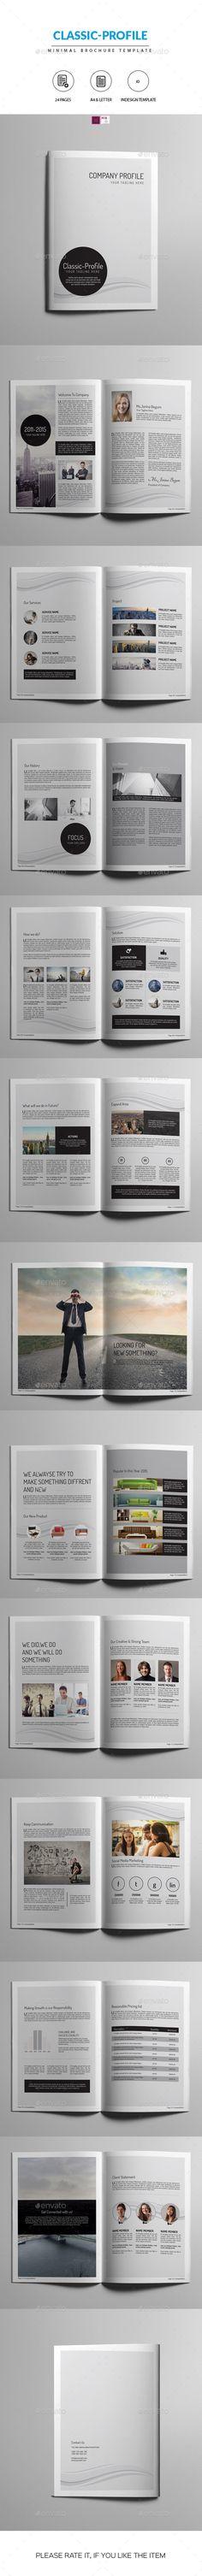 Minimal Corporate Brochure-Indesign Tempalte #design Download: http://graphicriver.net/item/minimal-corporate-brochureindesign-template/12934210?ref=ksioks